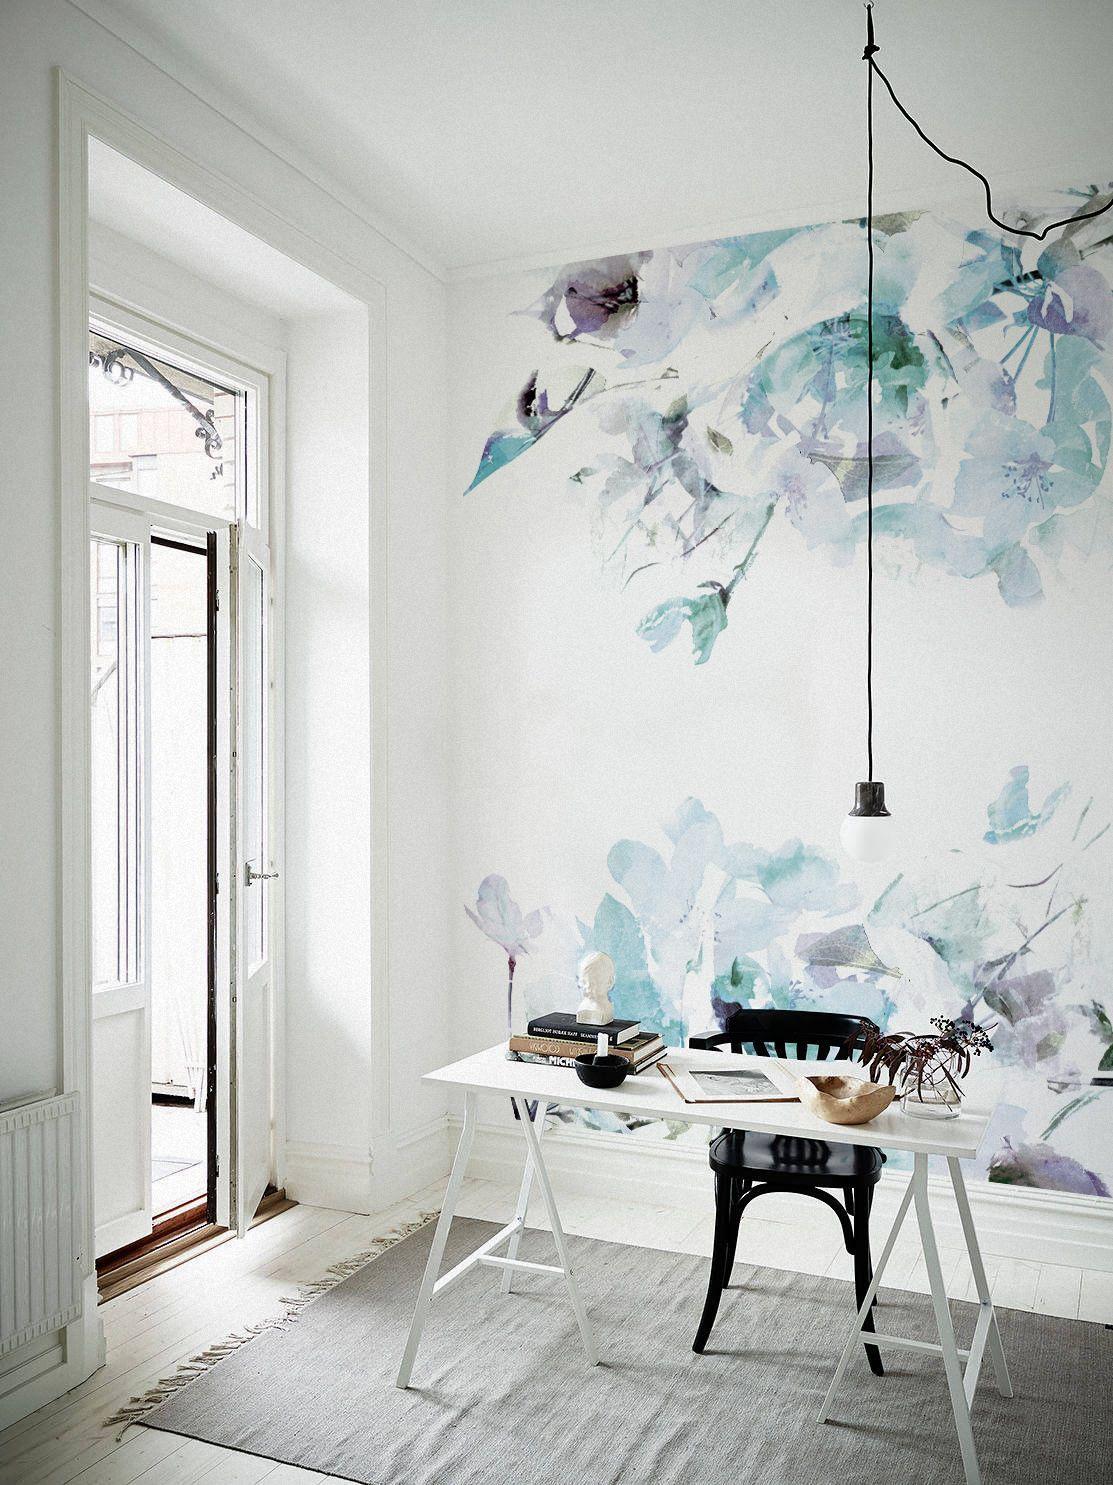 Blue Color Is Always A Good Option Blue Spring Floral Removable Wallpaper Creates A Decoracao Da Parede Do Bercario Aquarela Wallpaper Papel De Parede Floral